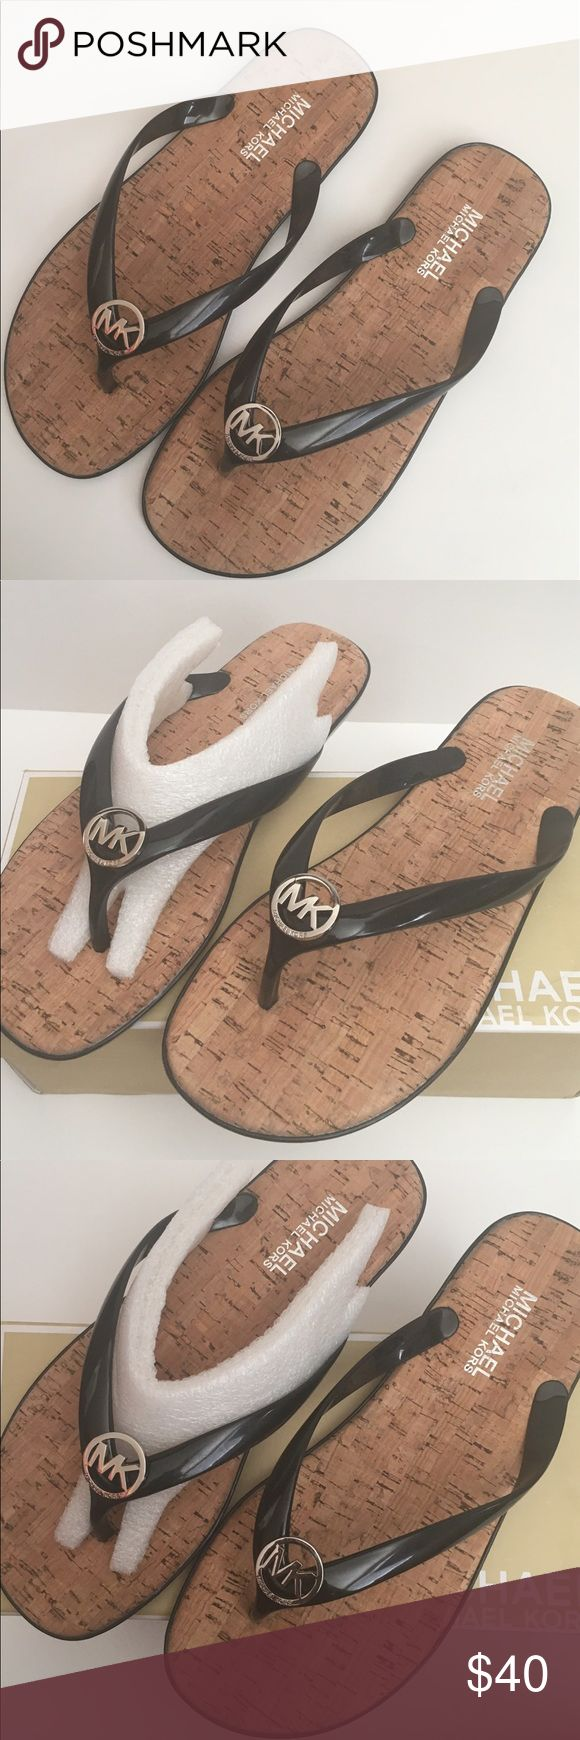 Black mk sandals - Michael Kors Sandals Michael Kors Sandals In Black With Silver Mk Logo New Never